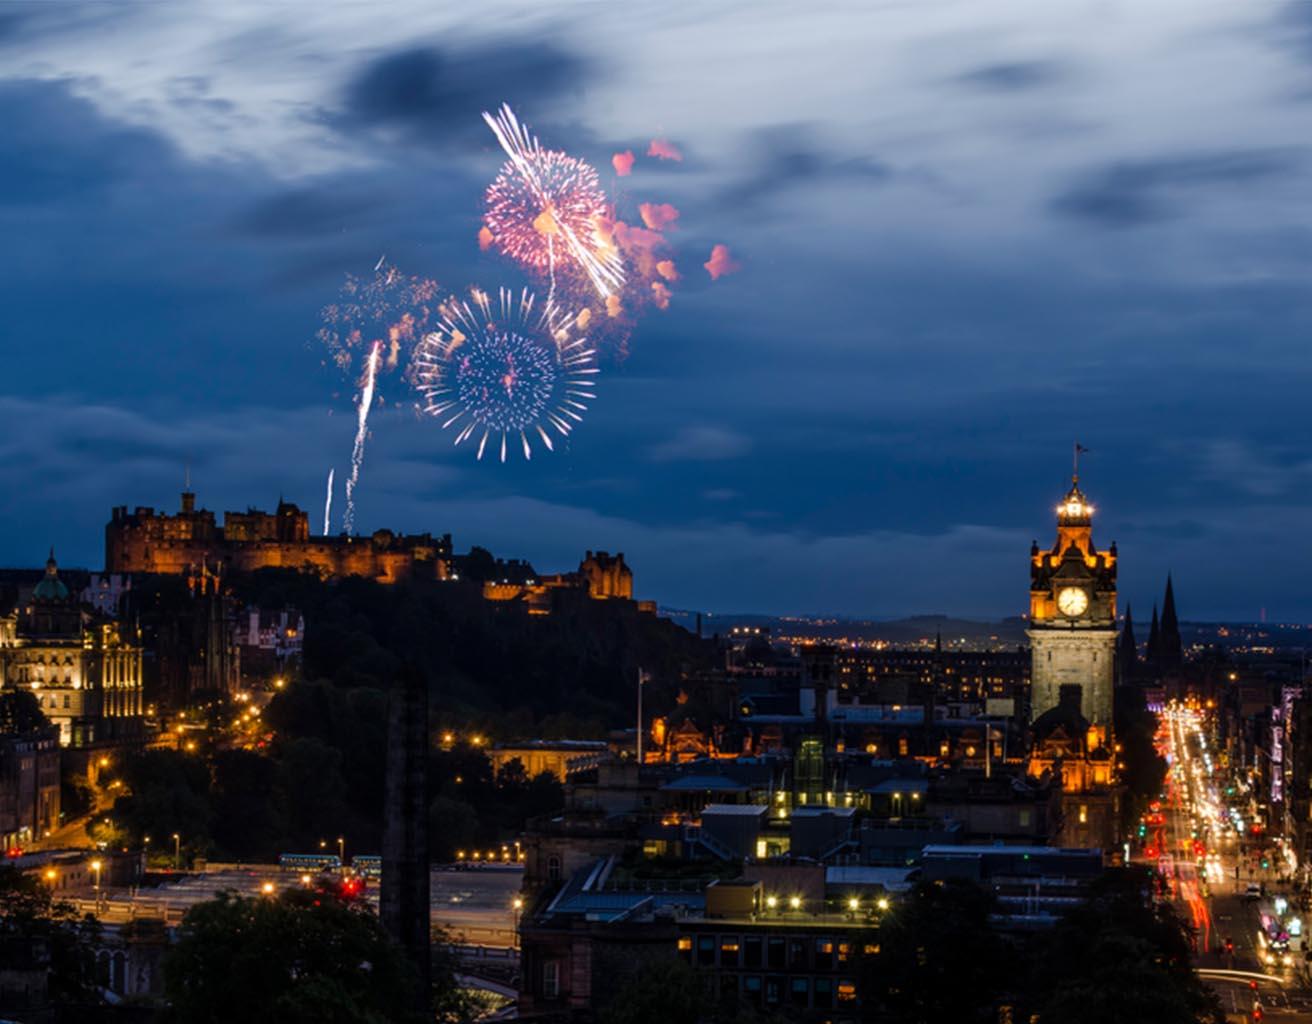 Edinburgh fireworks over the castle at Hogmanay.